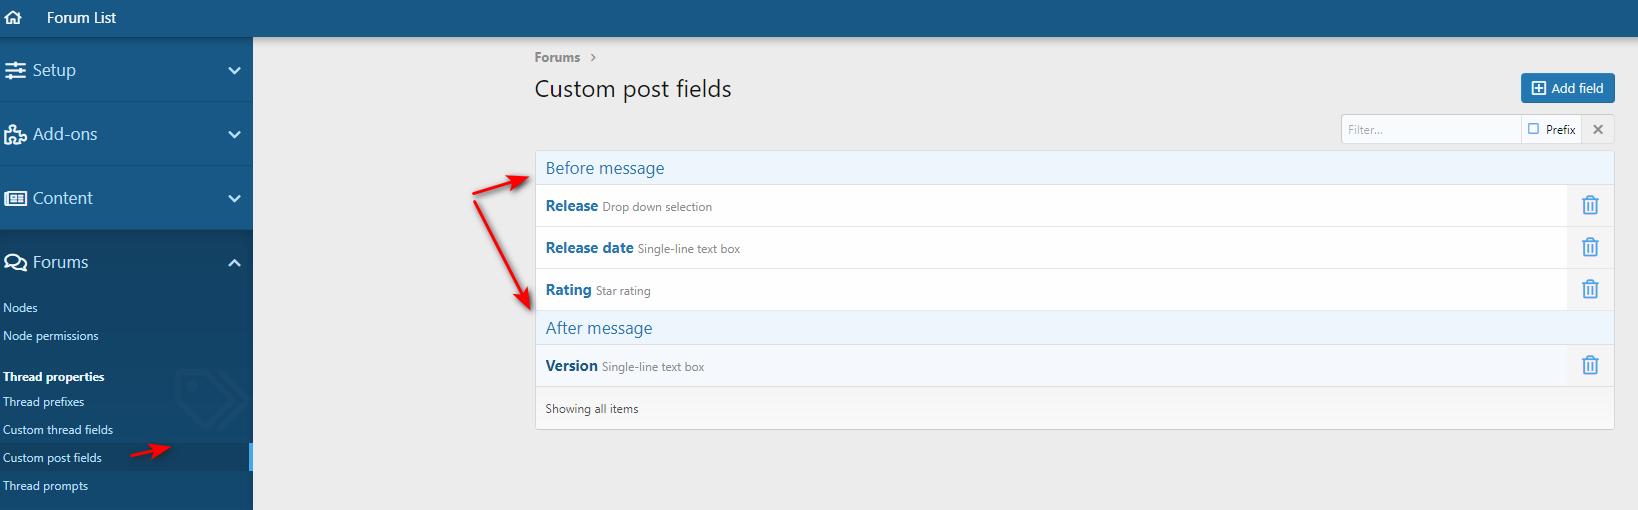 Custom_Fields_ACP_List.png